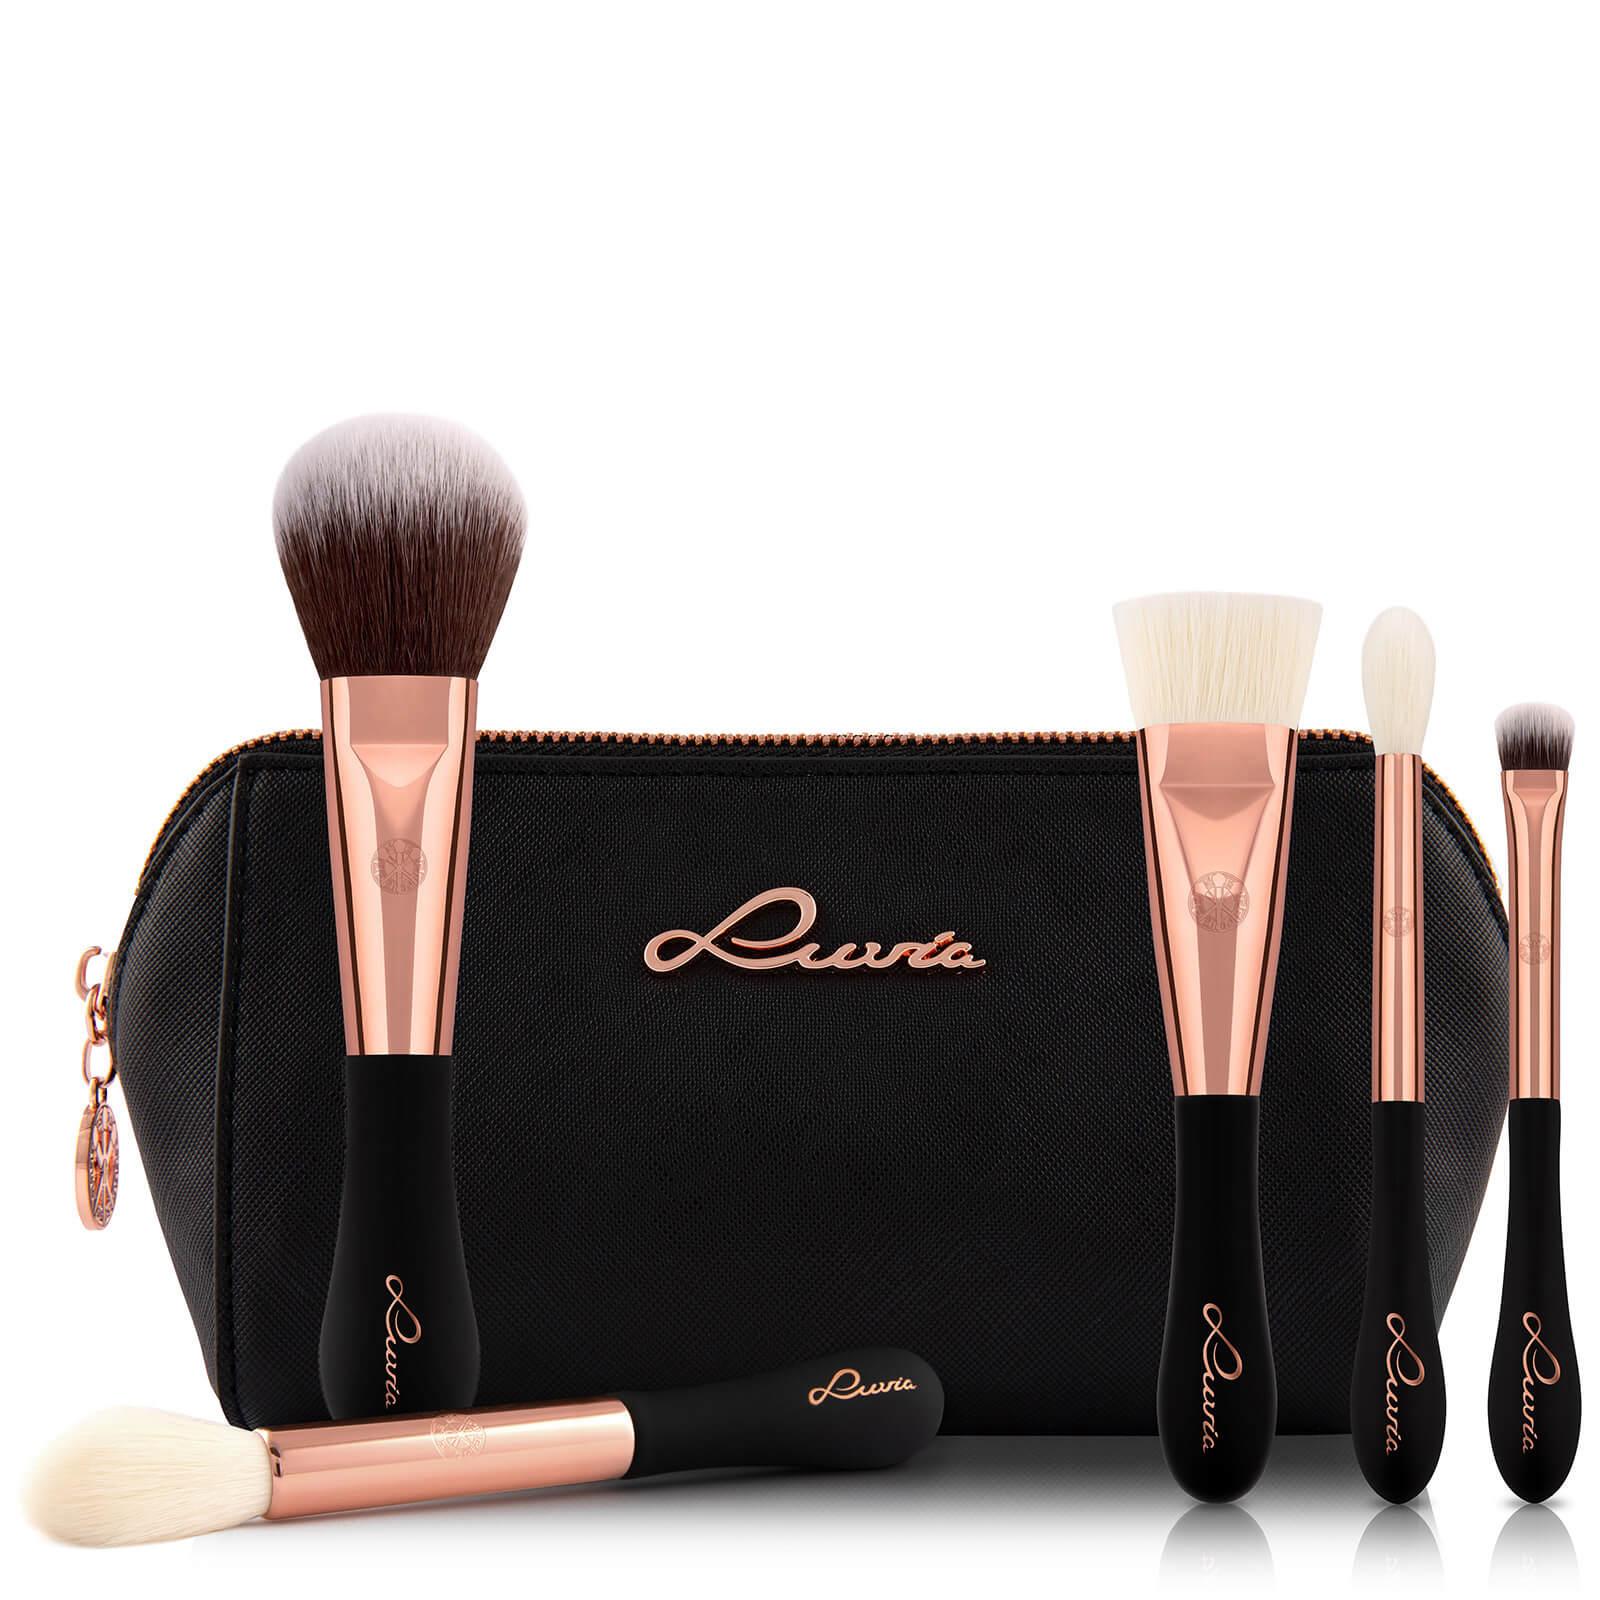 Купить Luvia Vegan Signature Brush Set